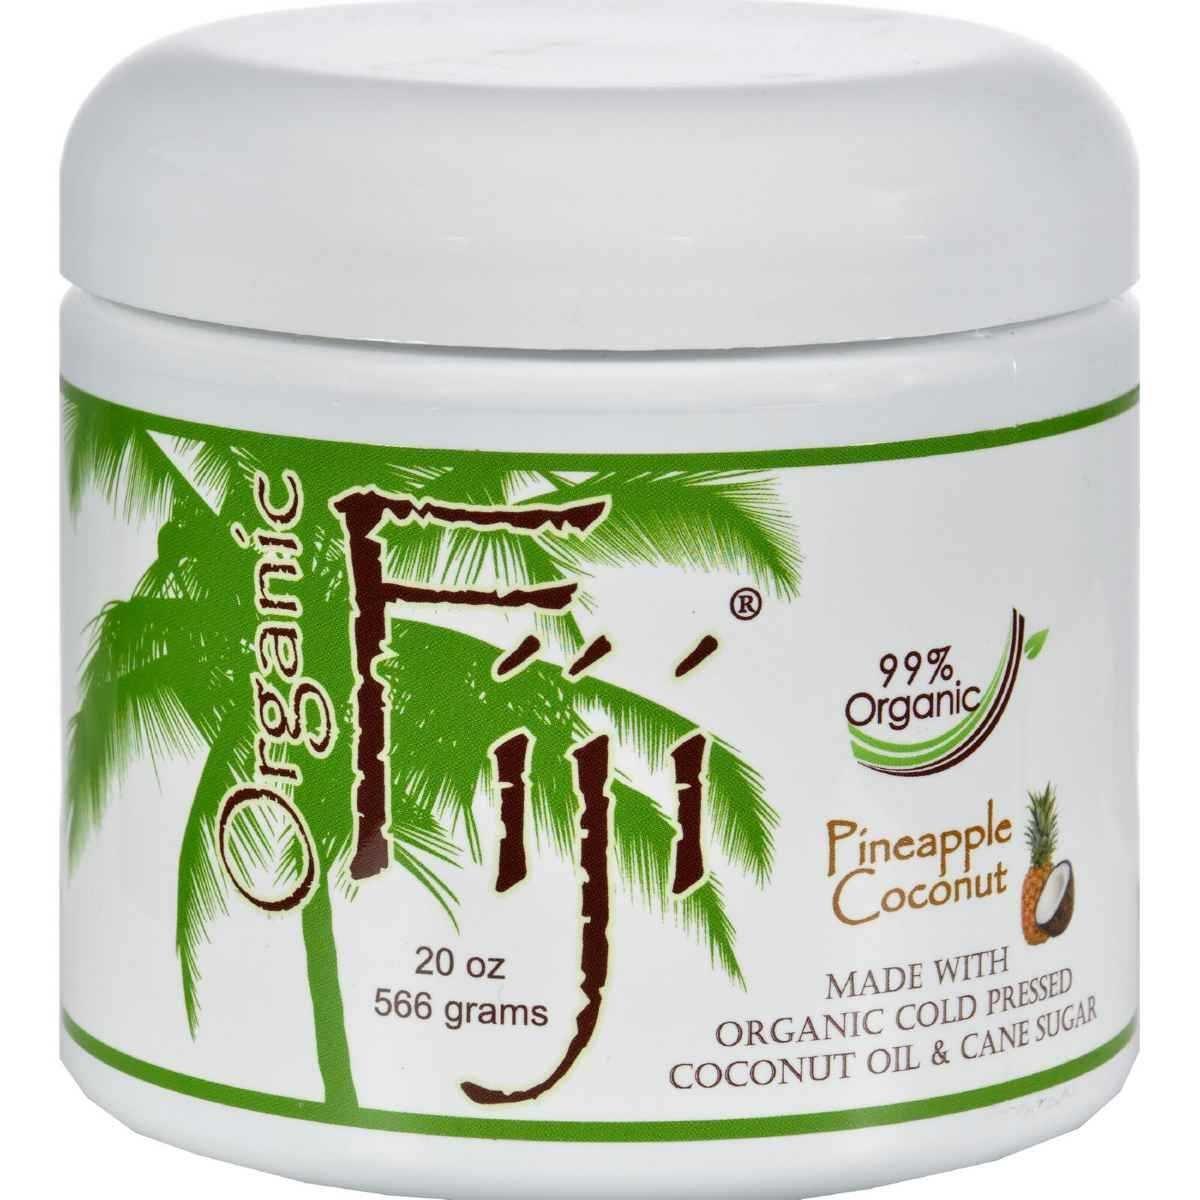 Health Life Organic Fiji Sugar Scrub, Pineapple Coconut, 20-Ounces 088